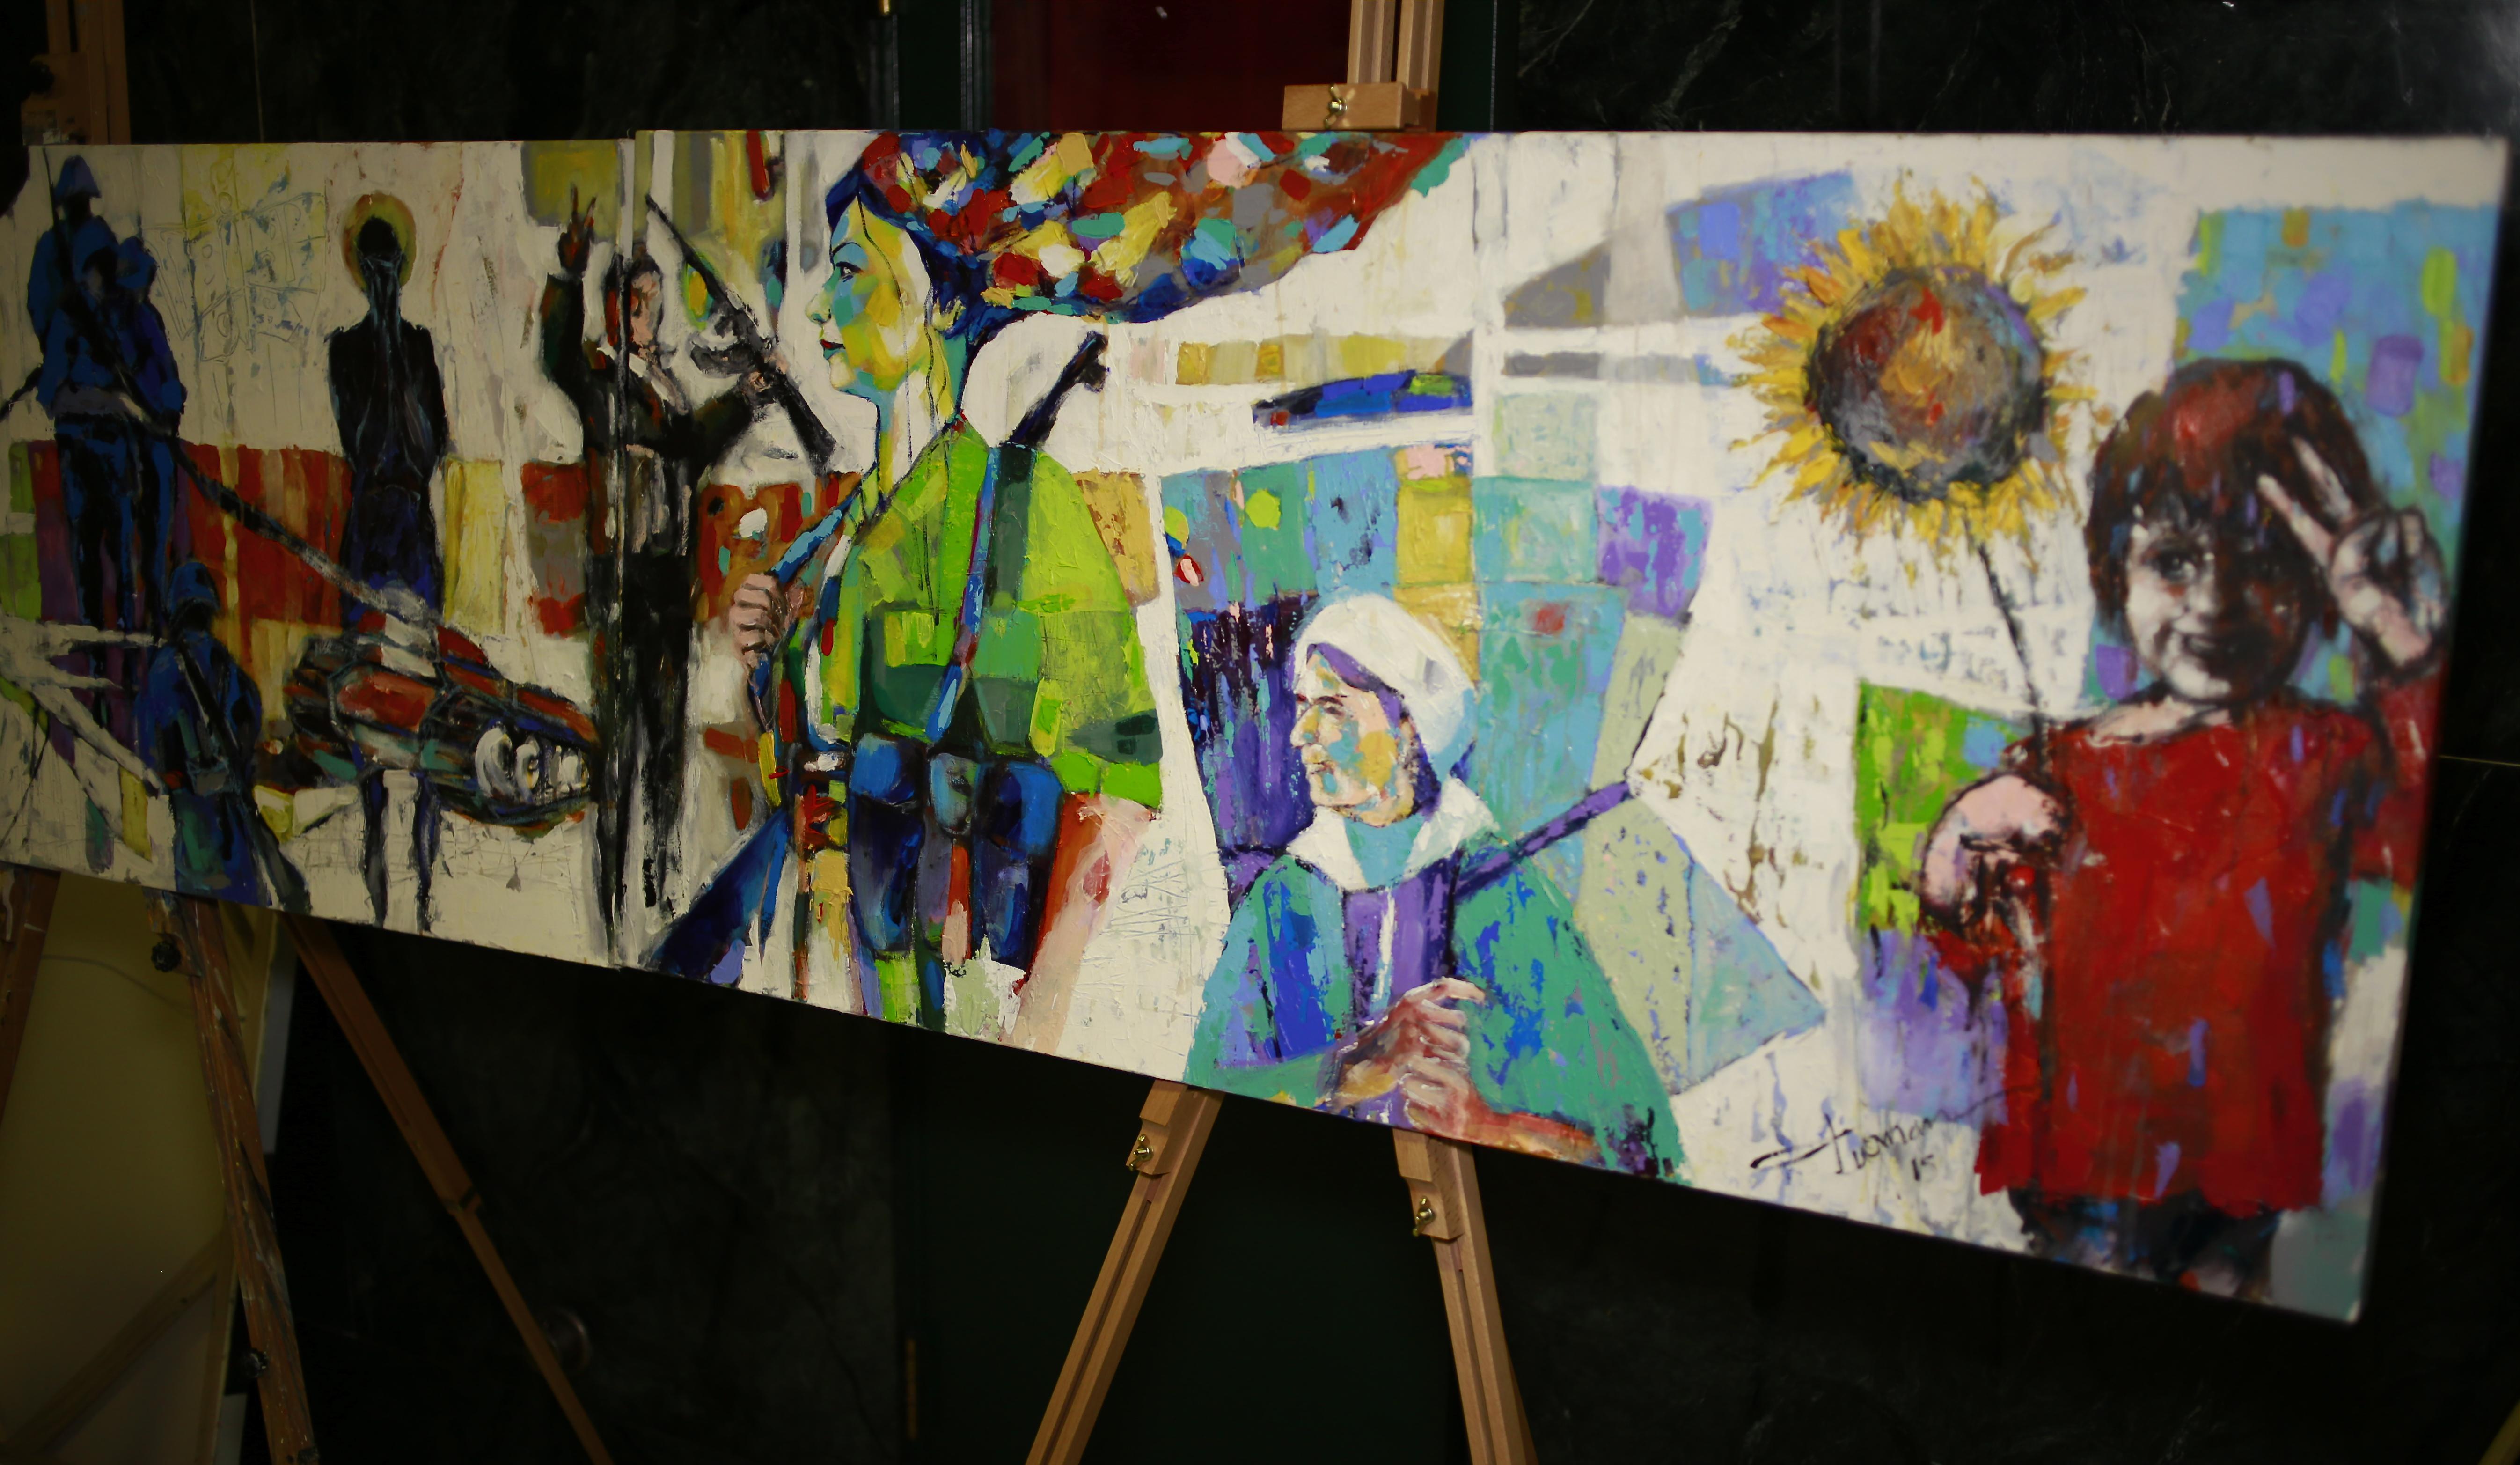 VOA journalist tells story of Kurdish Syrians through art